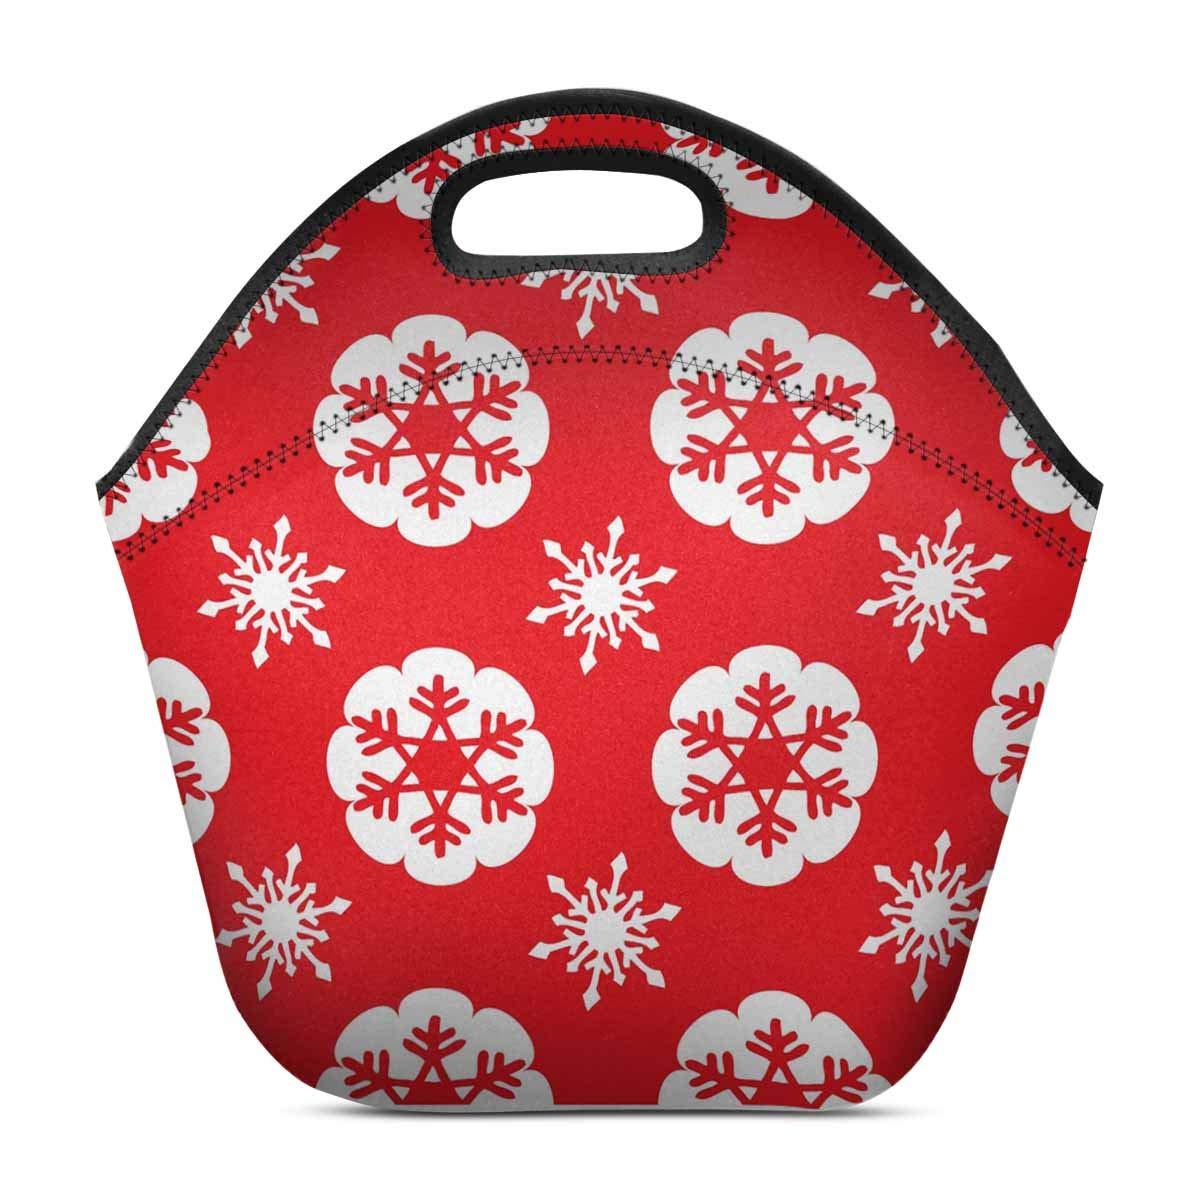 fe1abde9f345 Amazon.com: InterestPrint Neoprene Lunch Bag Christmas Snowflake ...